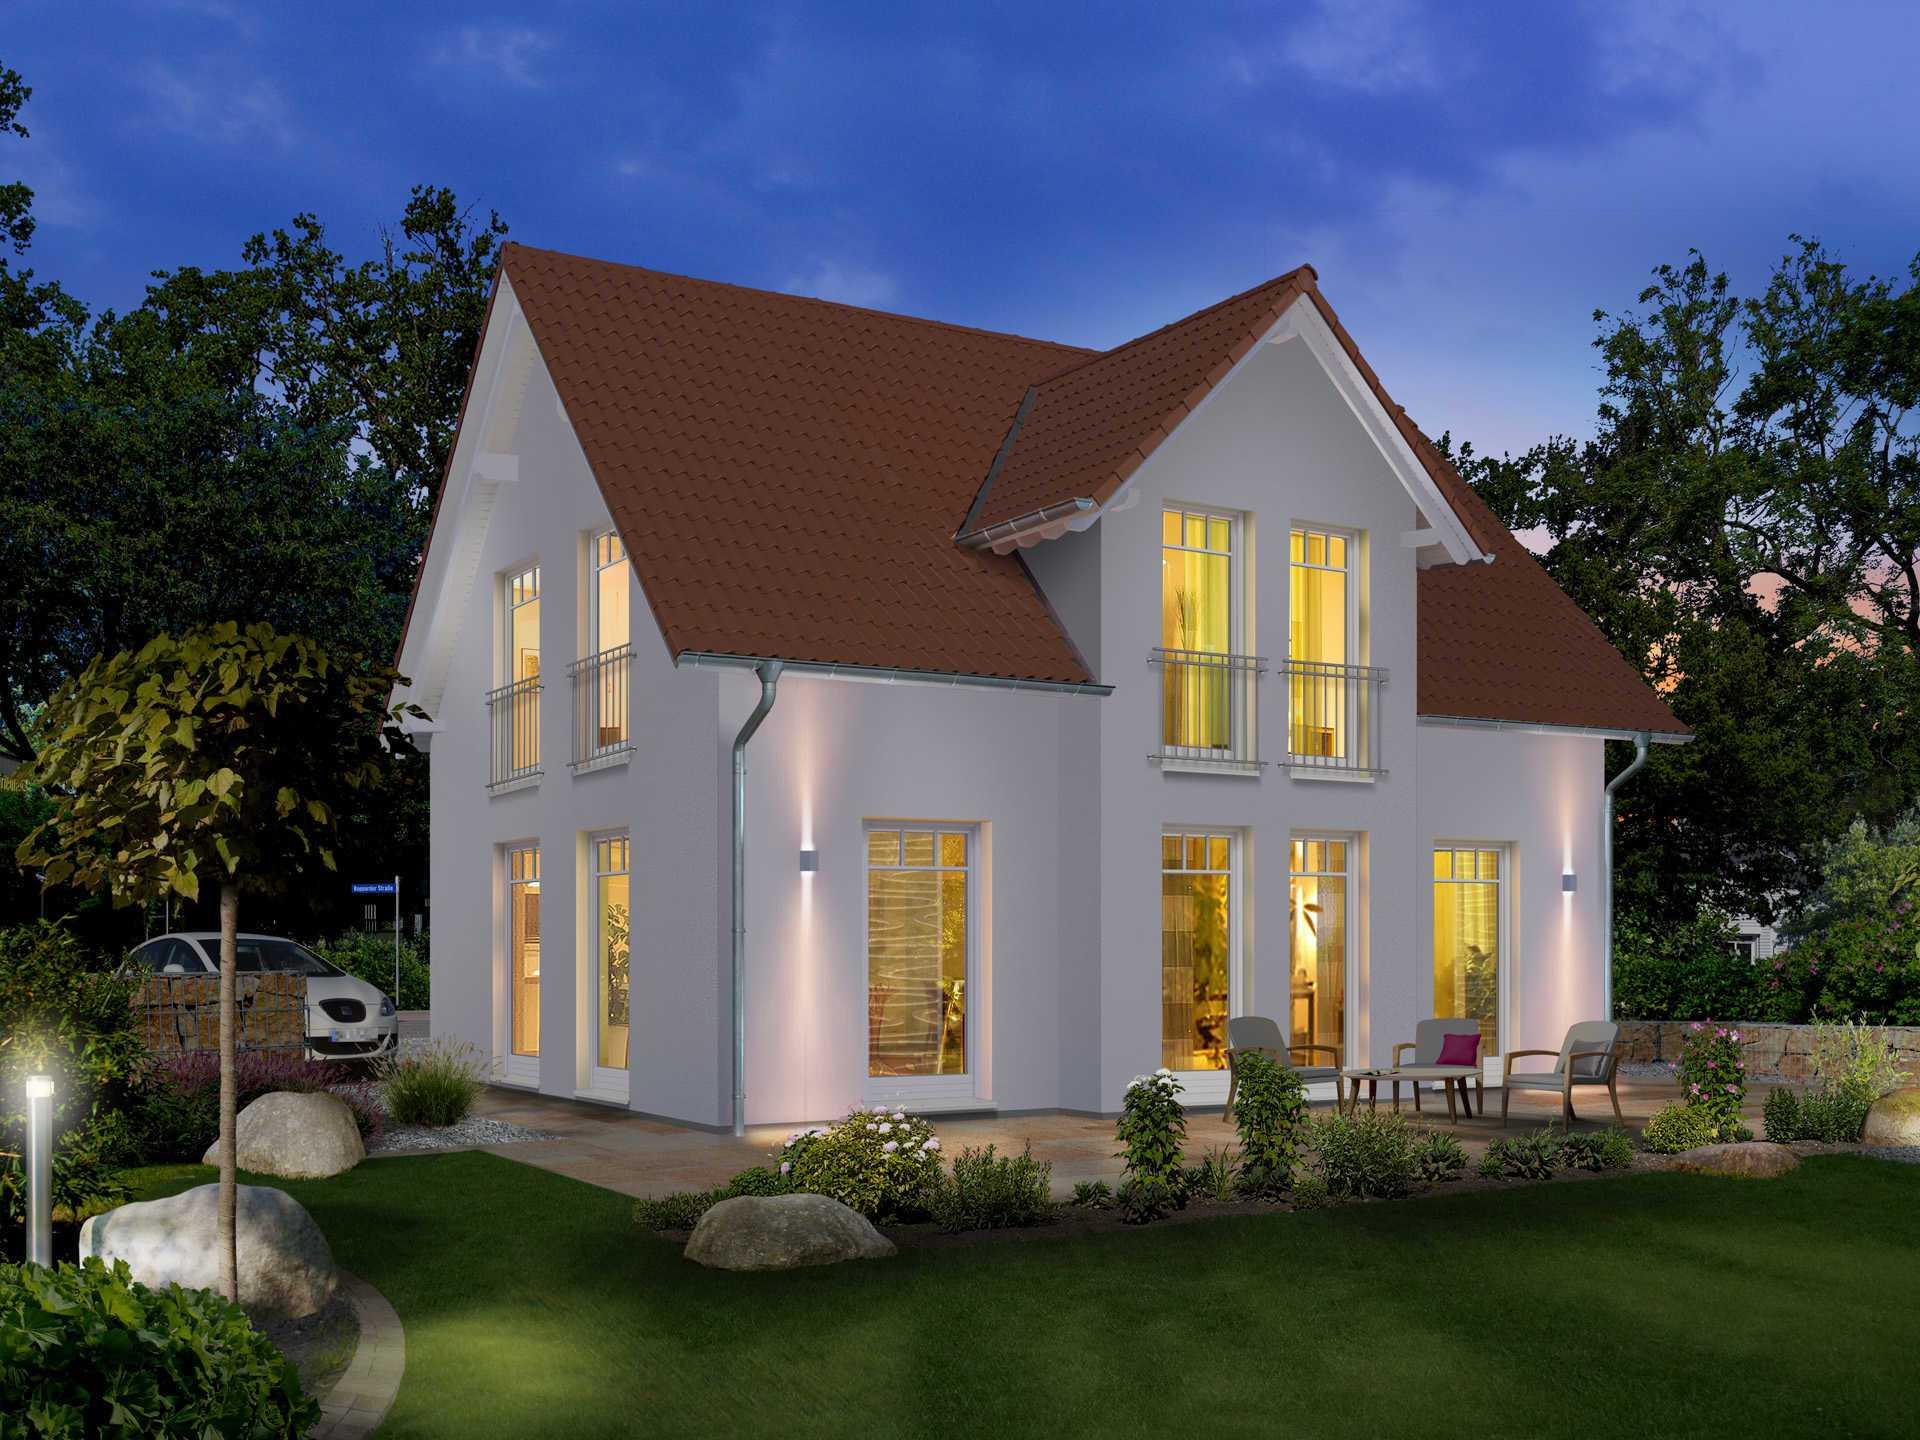 Lichthaus 112 Langer Massivbau - Town & Country Partner